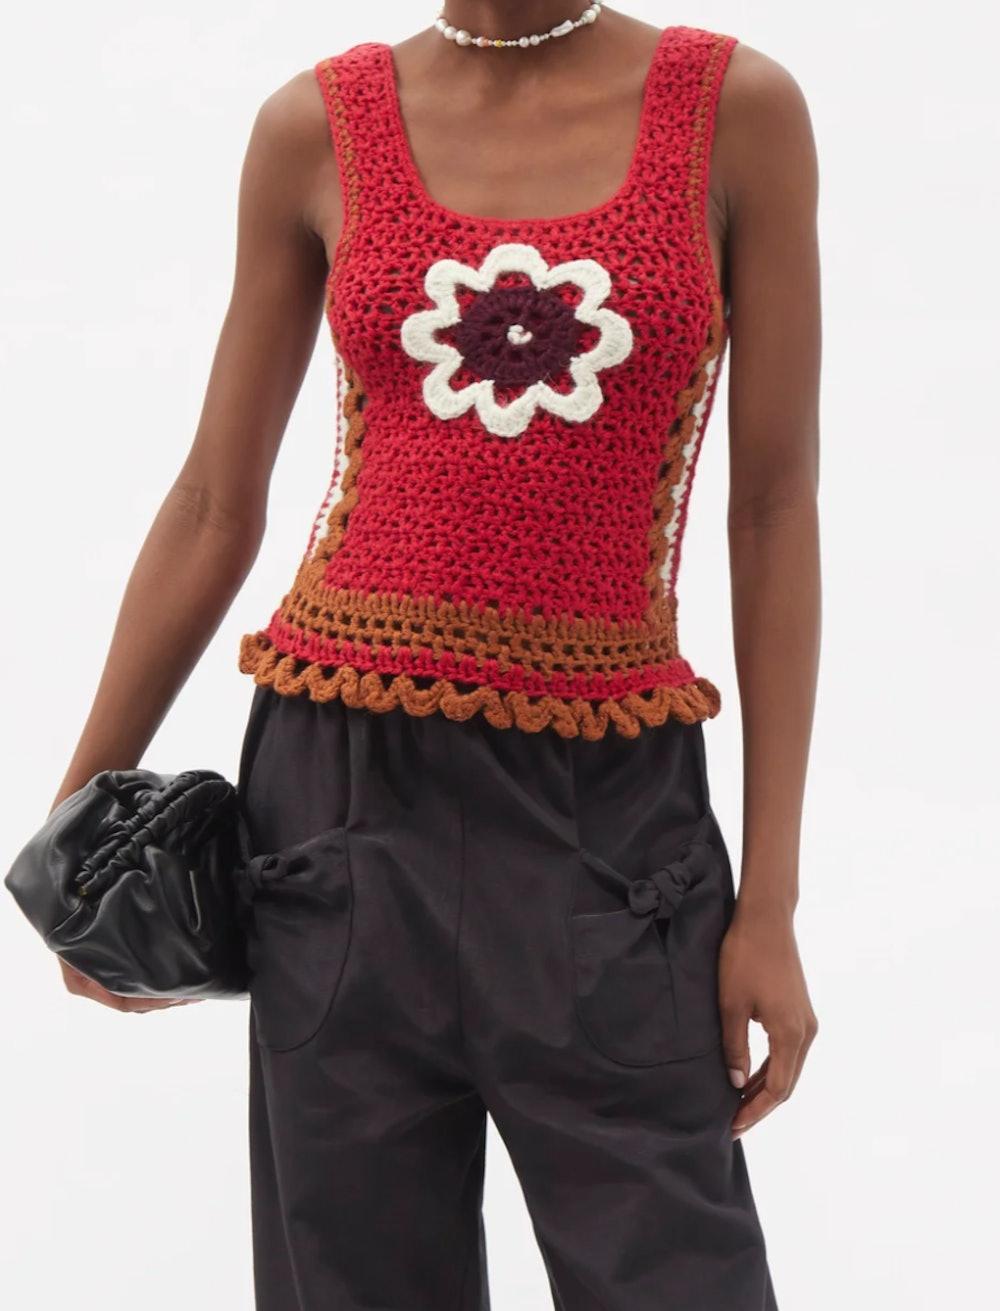 Daisy-Appliqué Crochet Top